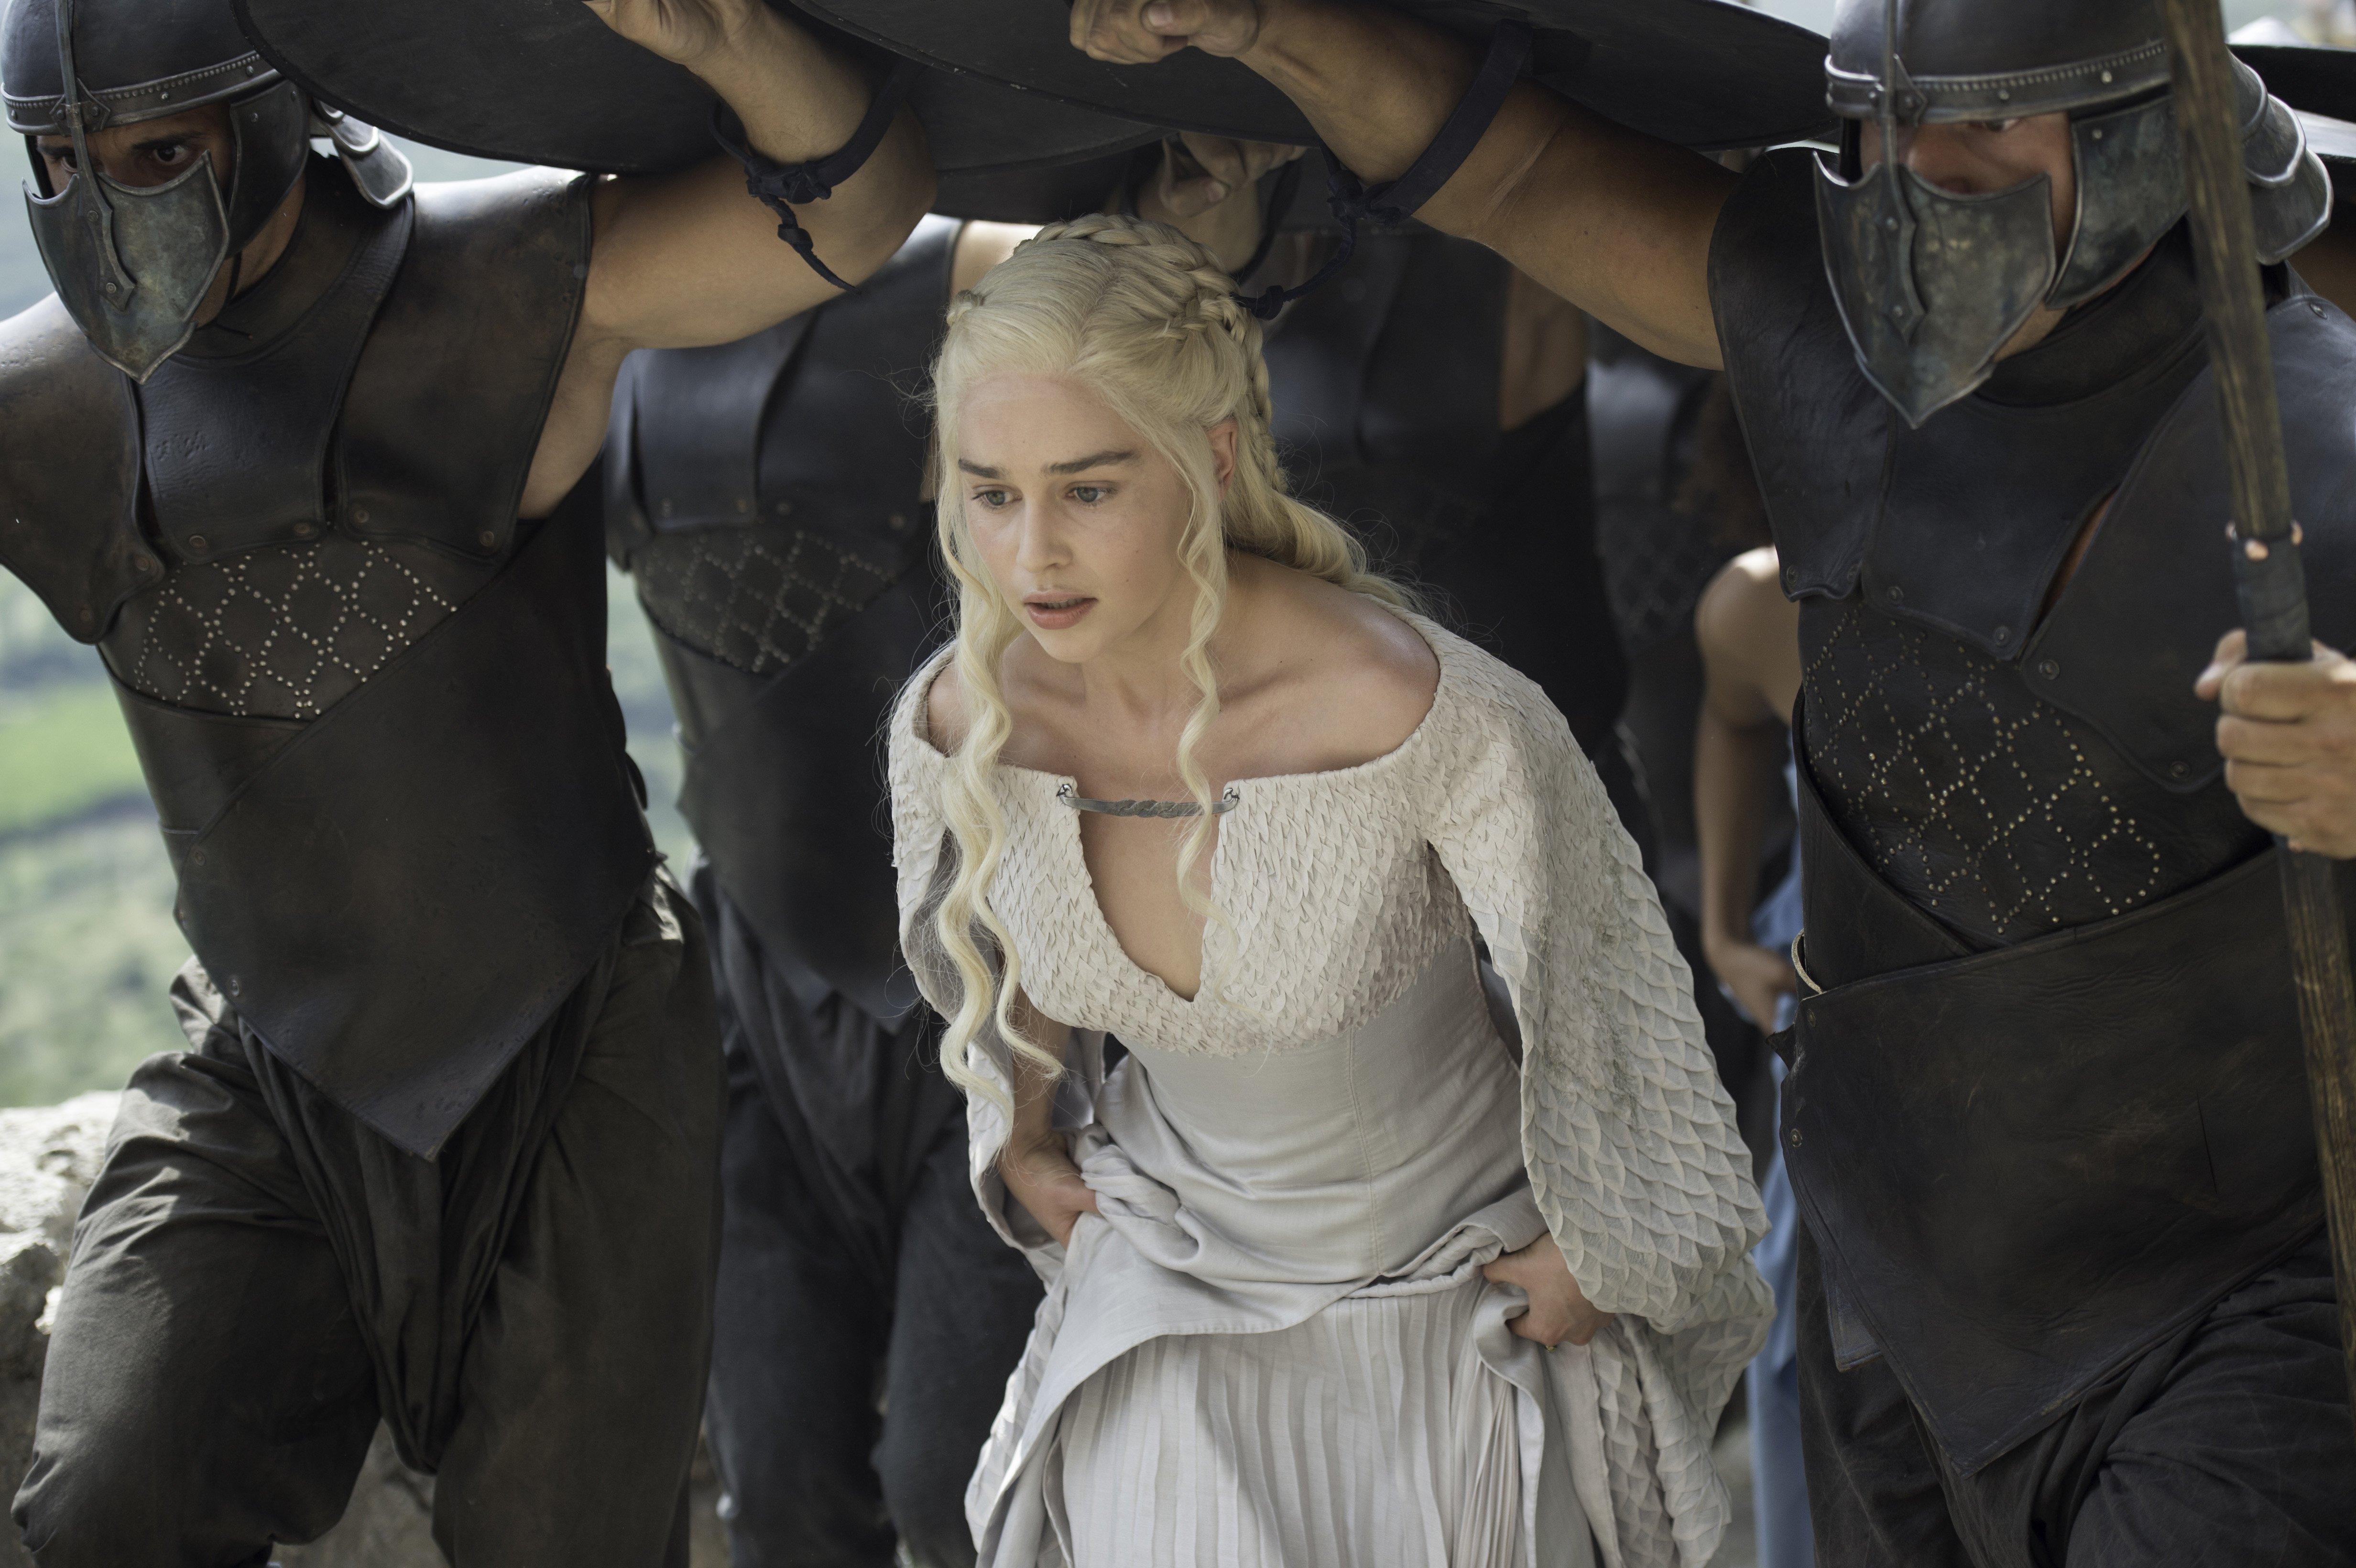 Daenerys targaryen and khal drogo wallpaper daenerys targaryen wedding - The 25 Best Daenerys Targaryen Wiki Ideas On Pinterest Asoiaf Wiki Daenerys Targaryen Title And Daenerys Targaryen Dragons Names